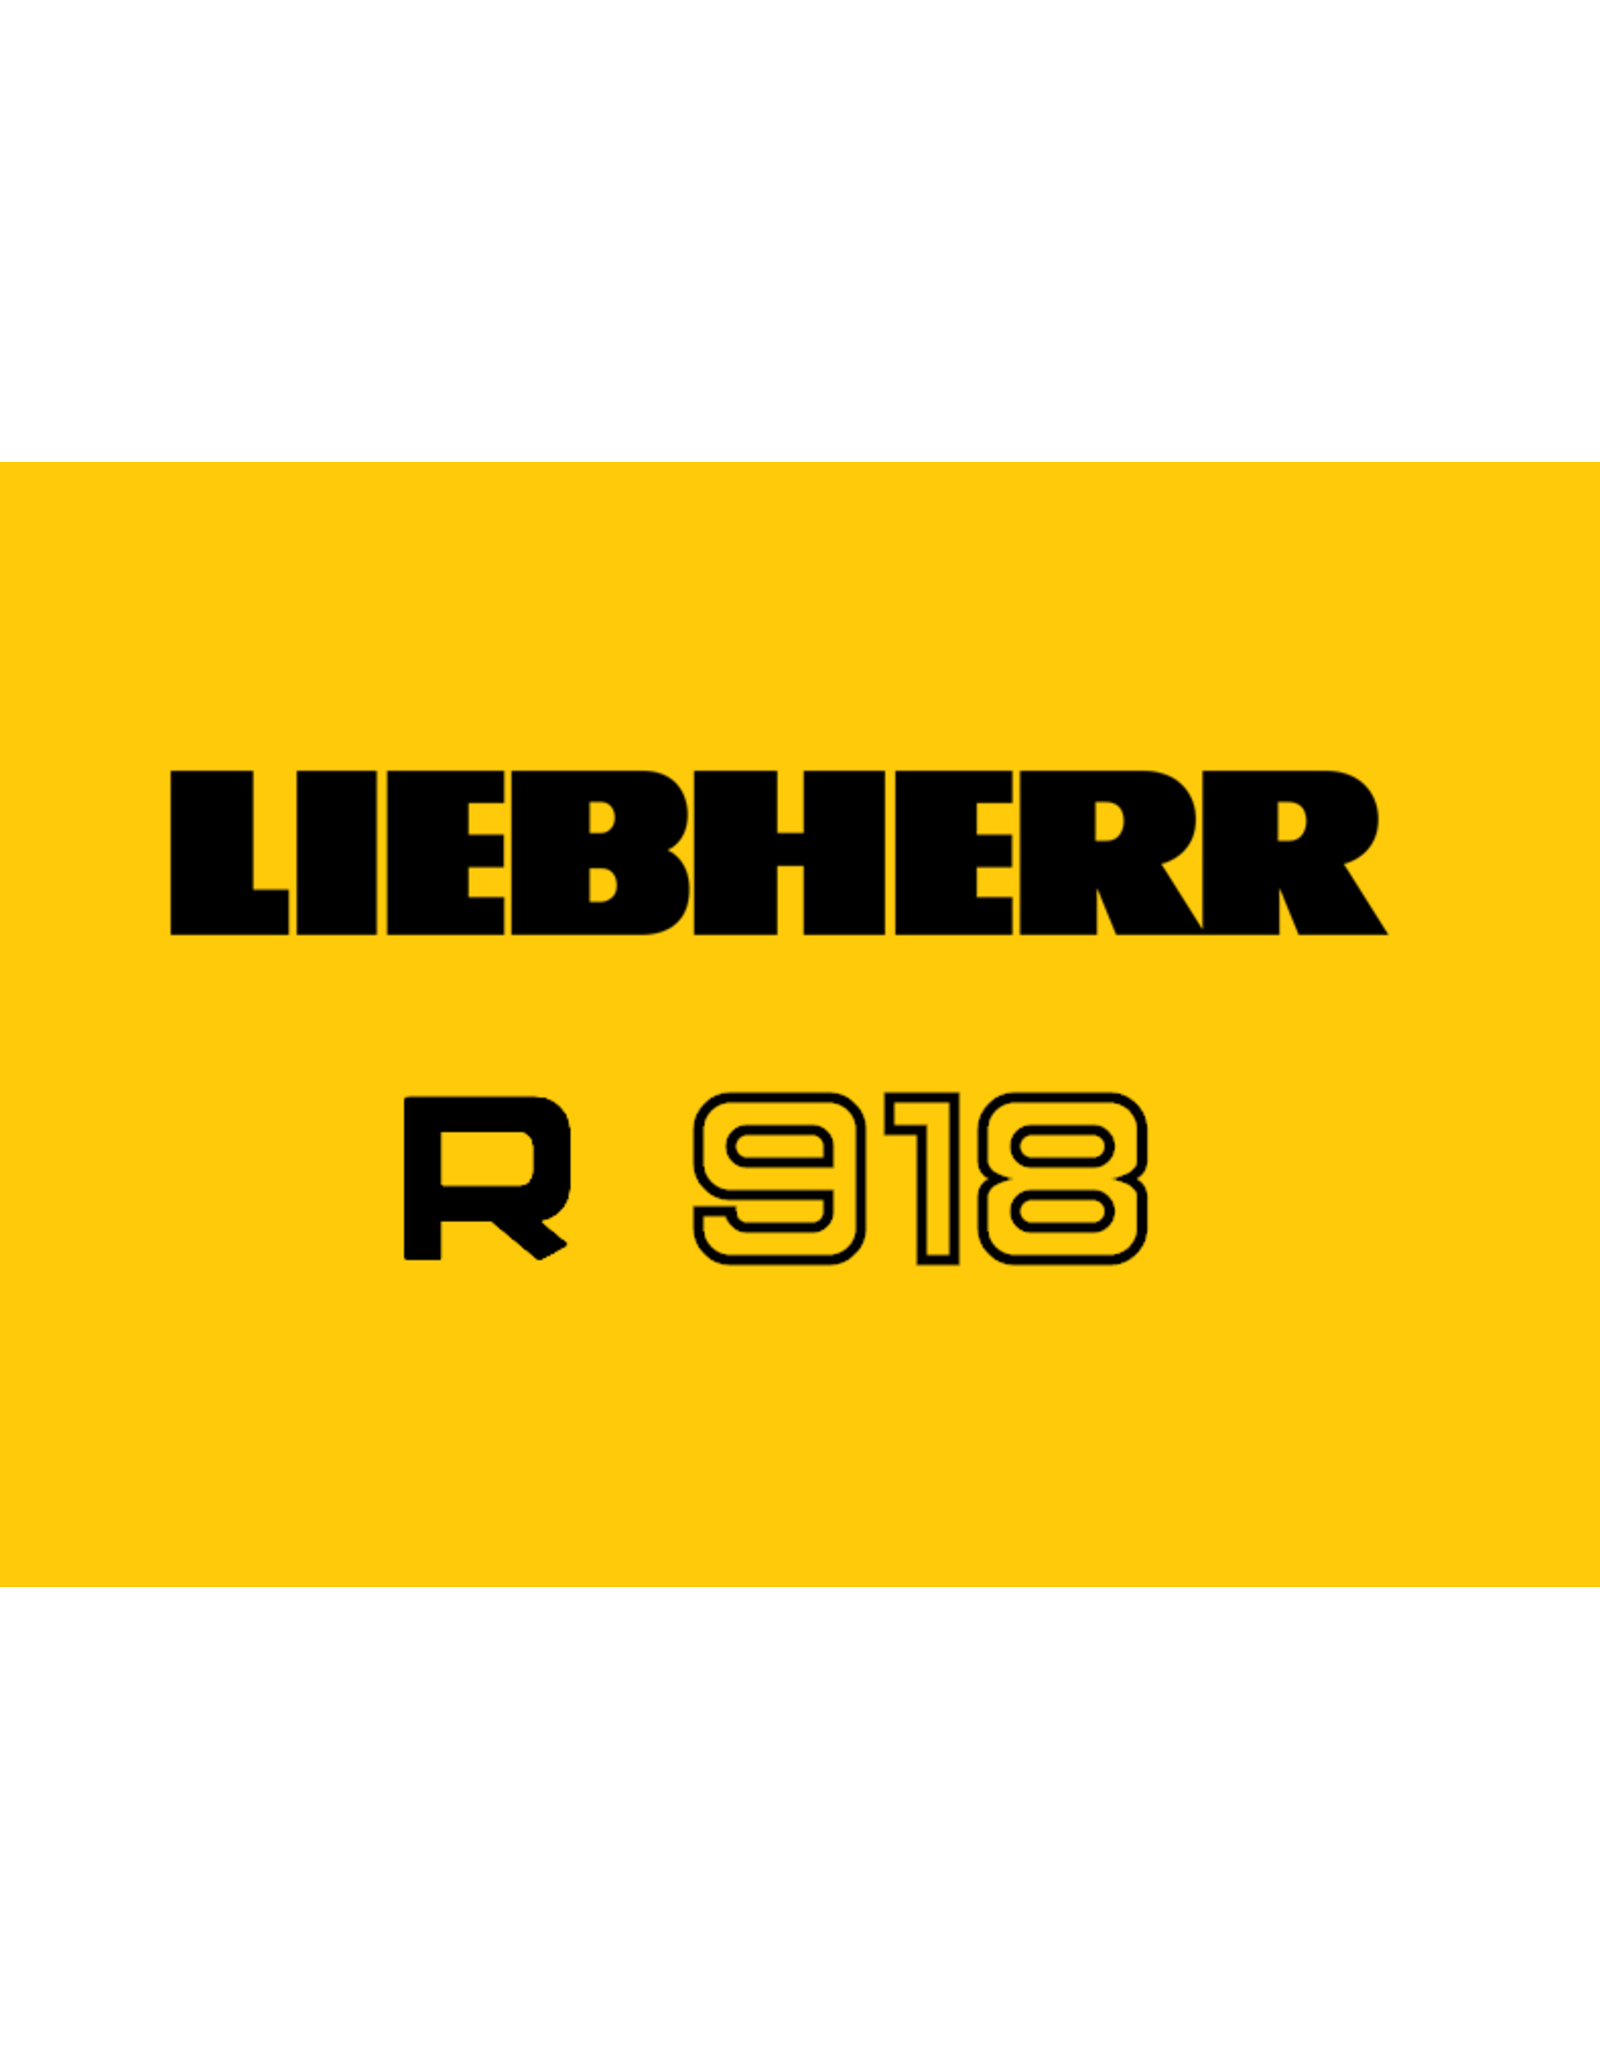 Echle Hartstahl GmbH FOPS for Liebherr R 918